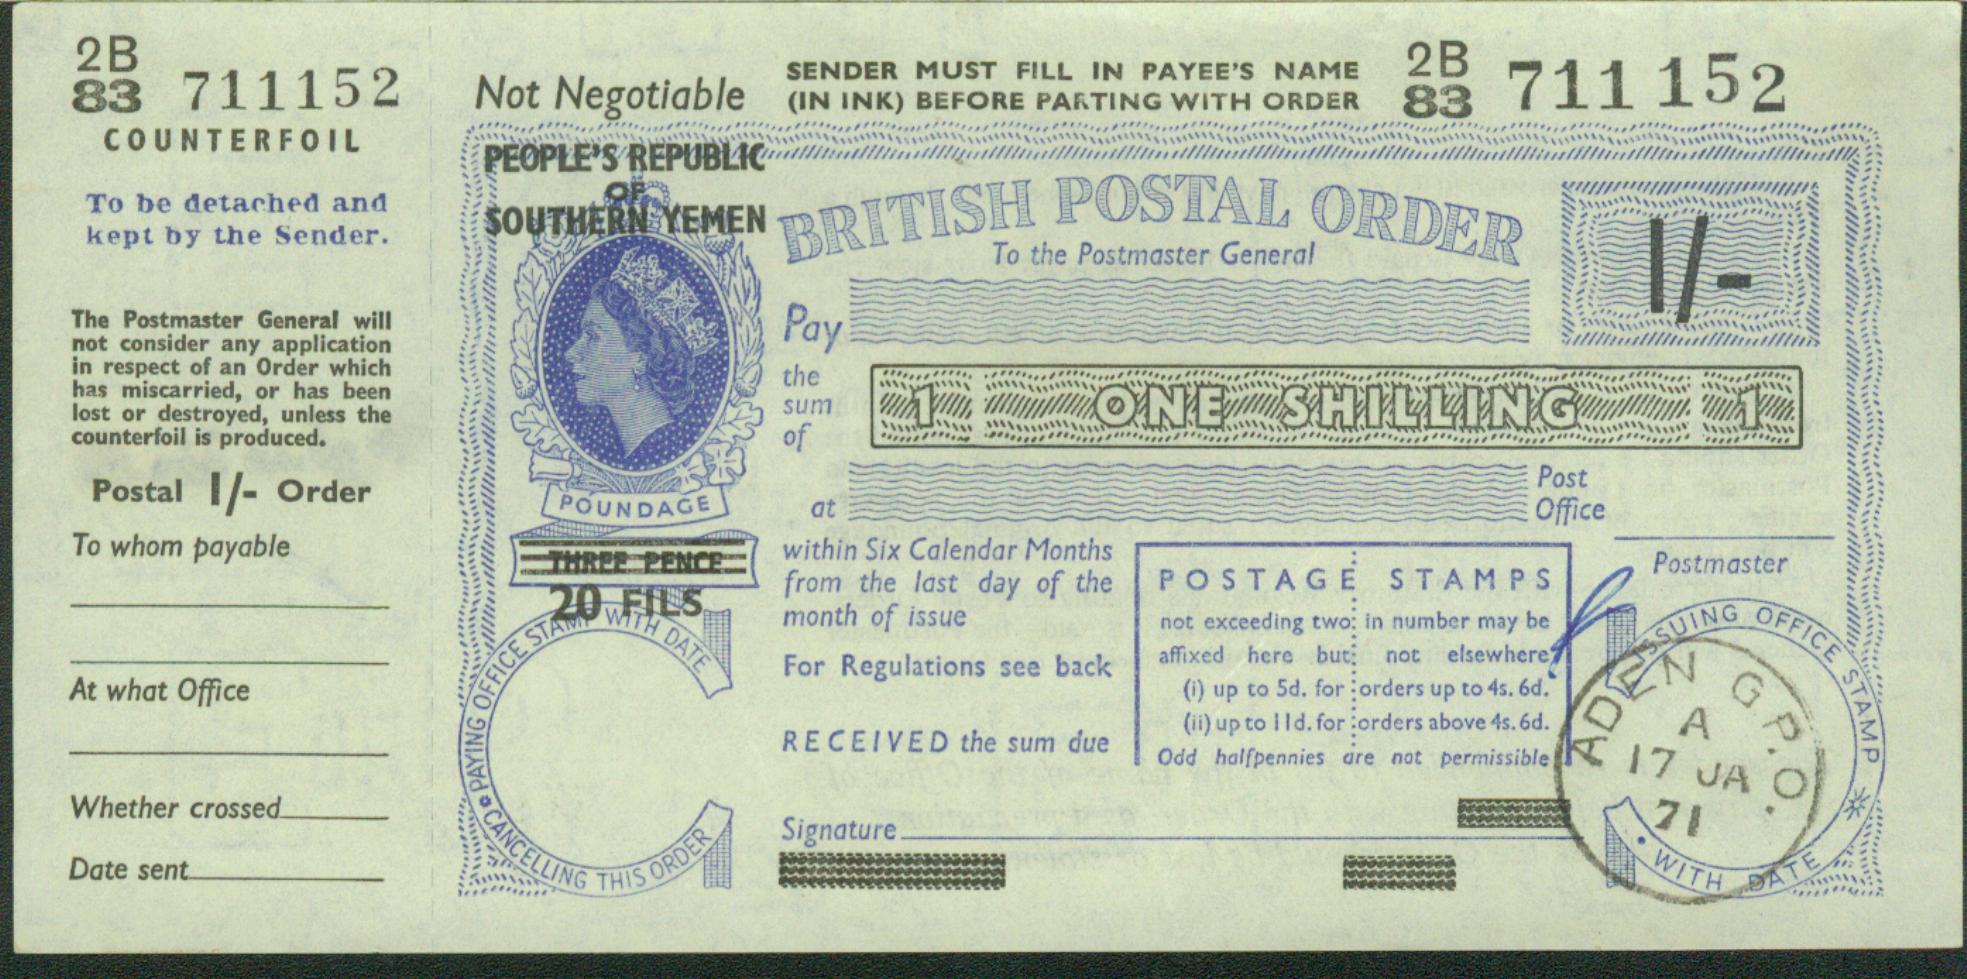 Southern Yemen (Peoples Republic) postal order